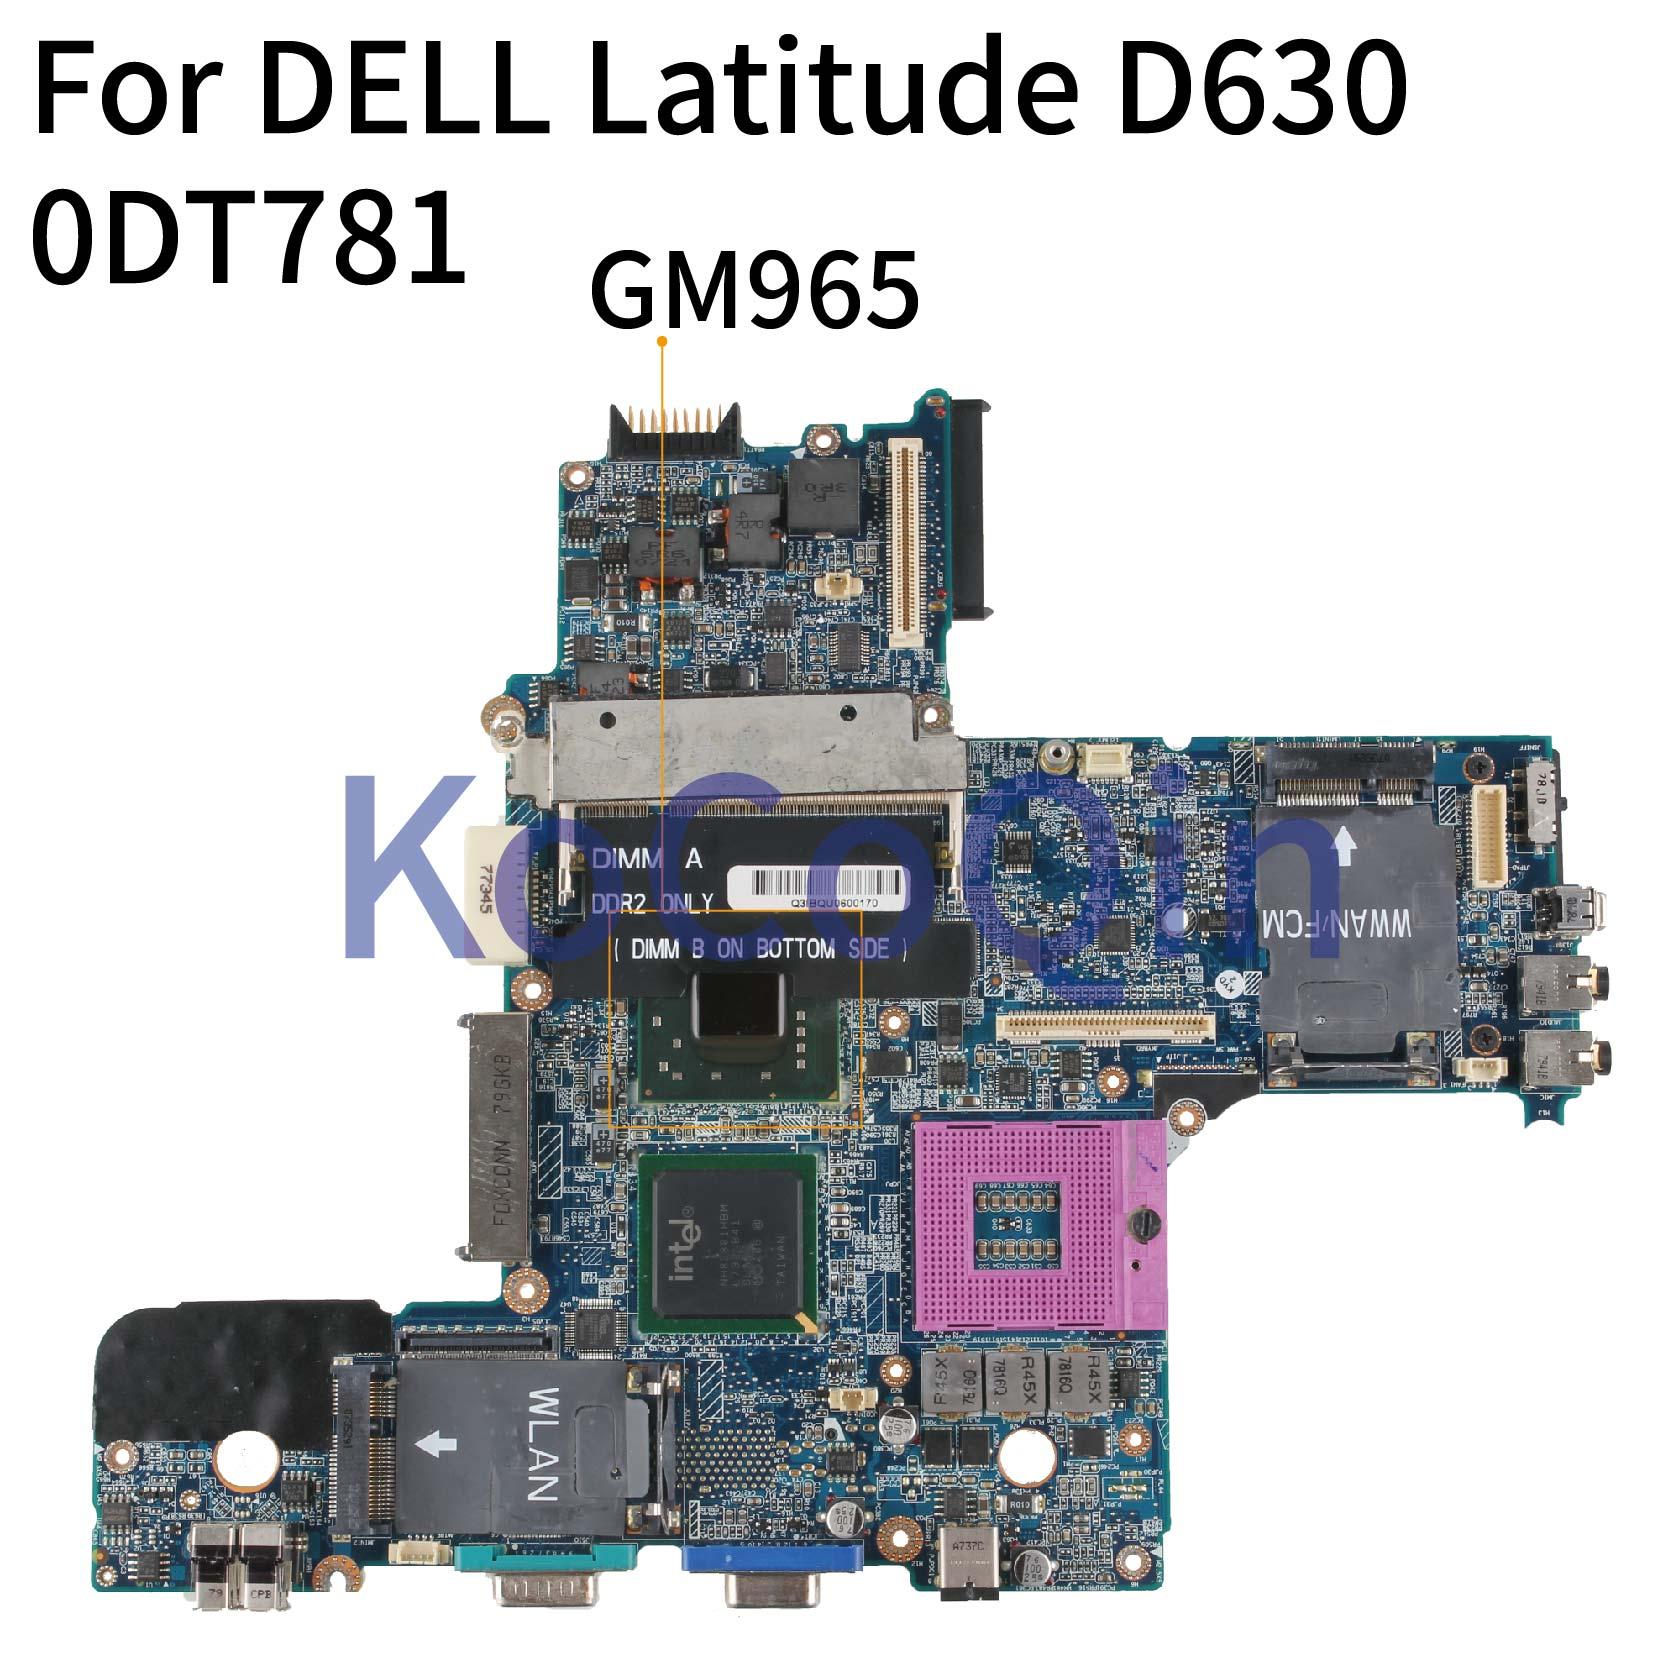 KoCoQin Laptop Motherboard For DELL Latitude D630 PP18L Mainboard CN-0DT781 0DT781 LA-3301P  GM965